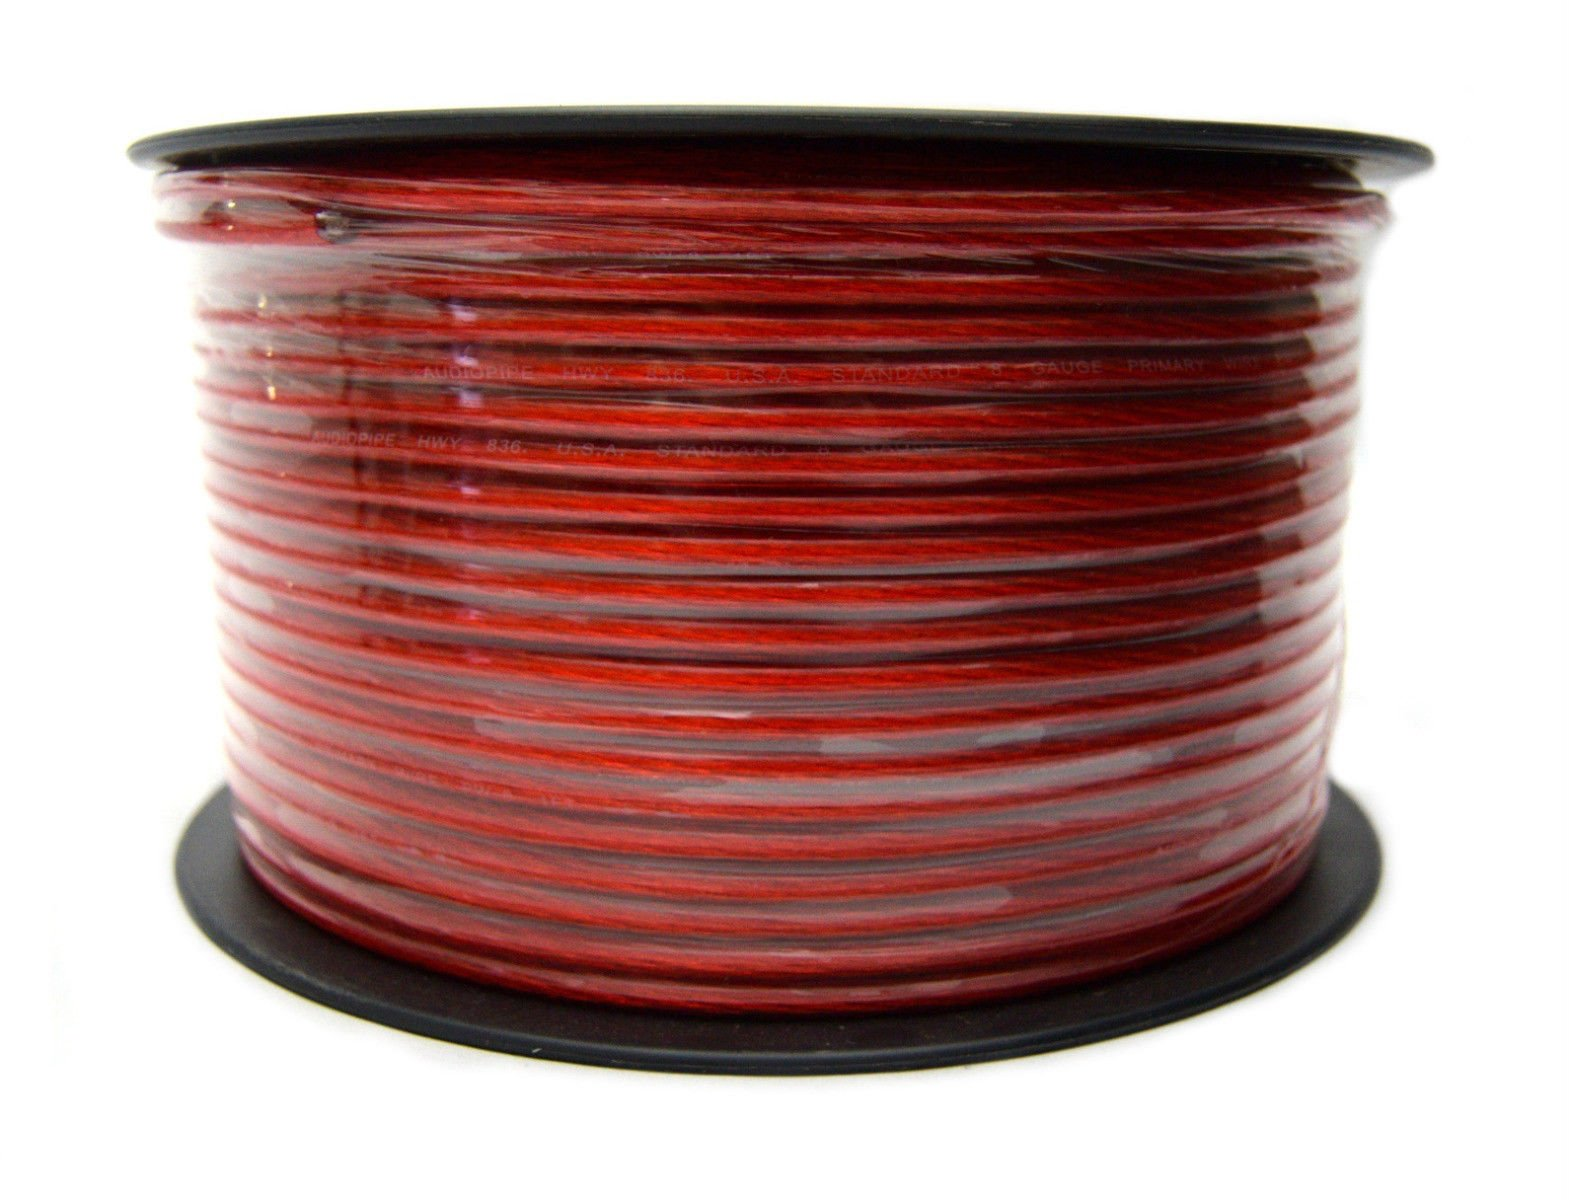 8 Gauge Red Power Primary Ground Wire 500 Feet Copper Mix Car Audio Amplifier